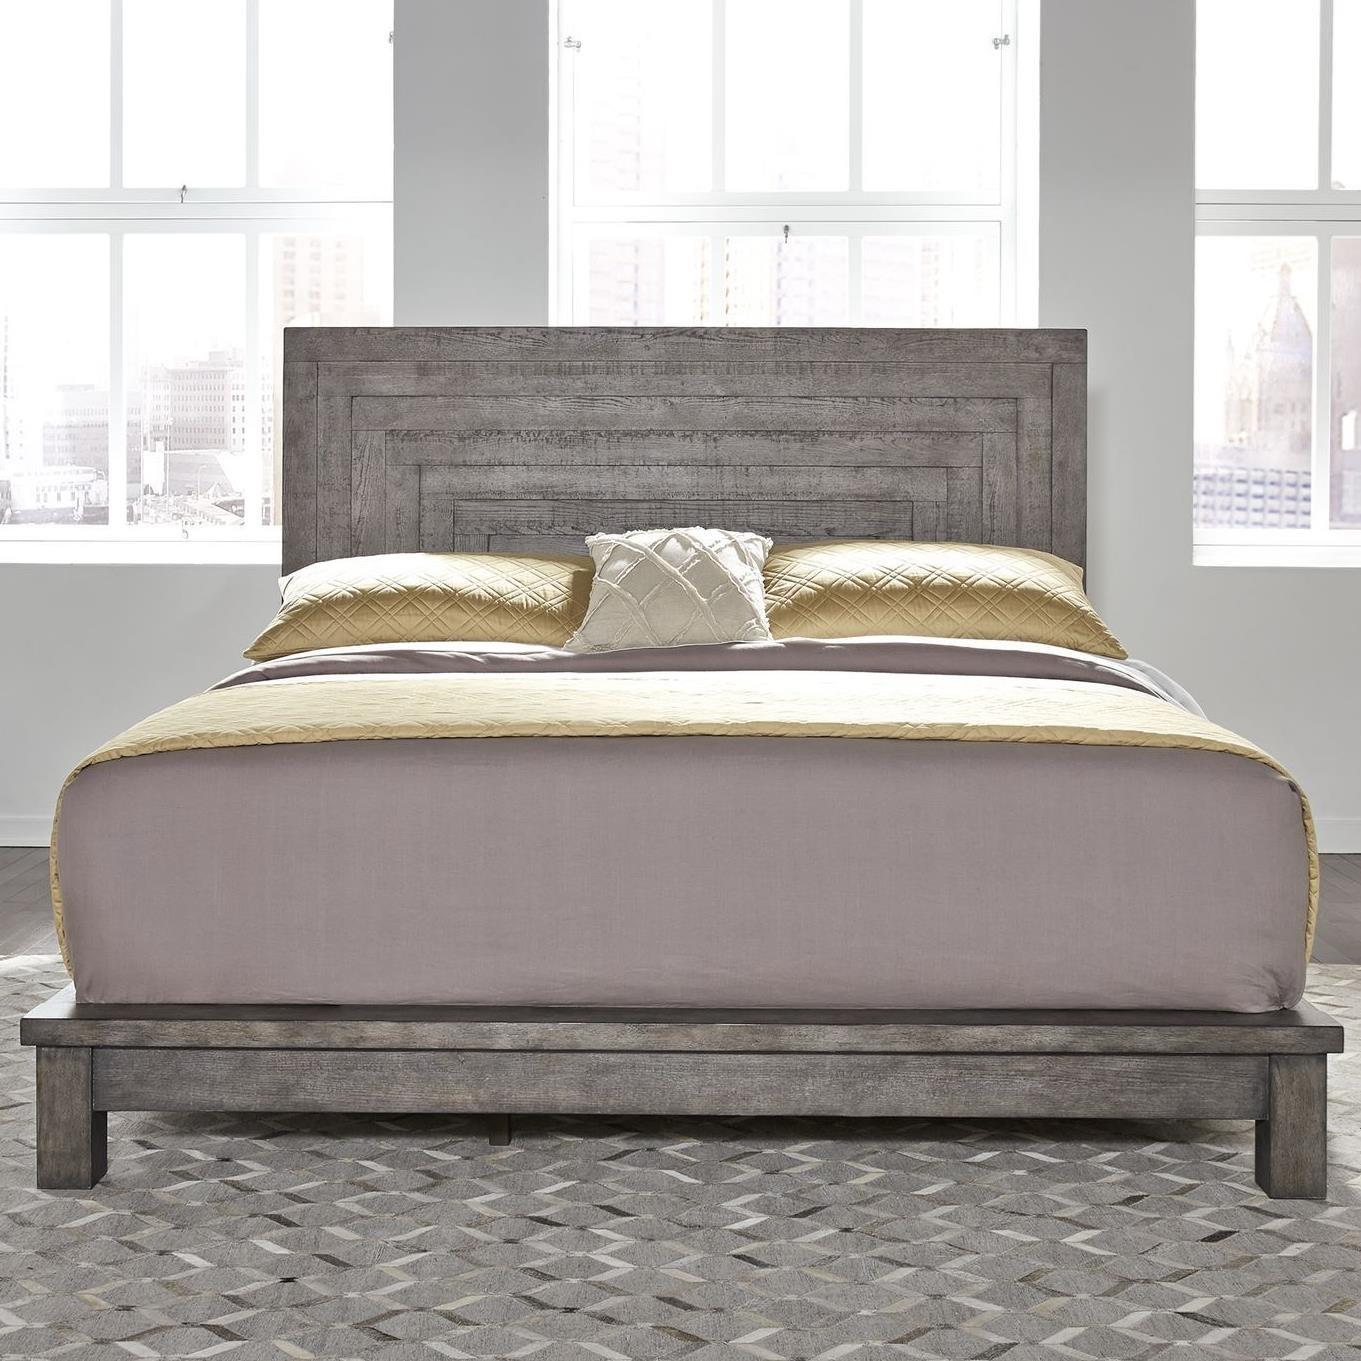 Modern Farmhouse California King Platform bed by Liberty Furniture at Beck's Furniture